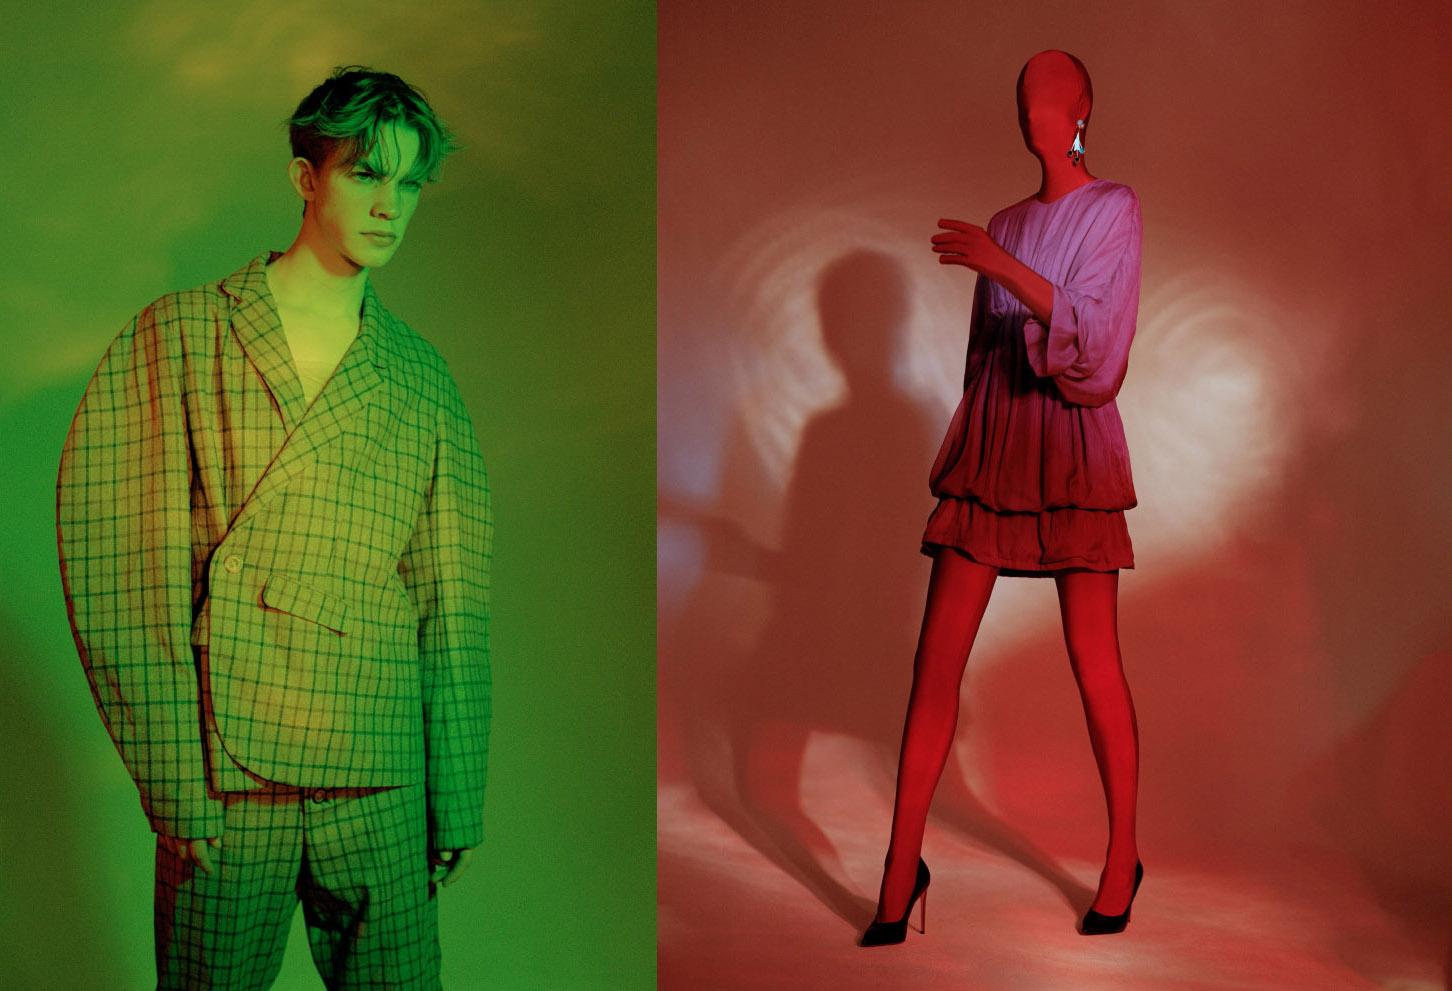 plaid woolen oversize suit   ROBERTO NIZZARI   red lycra morphsuit and purple viscose organza dress   GIULIA TOTOLA     earring   PEET DULLAERT     heels  LAUF